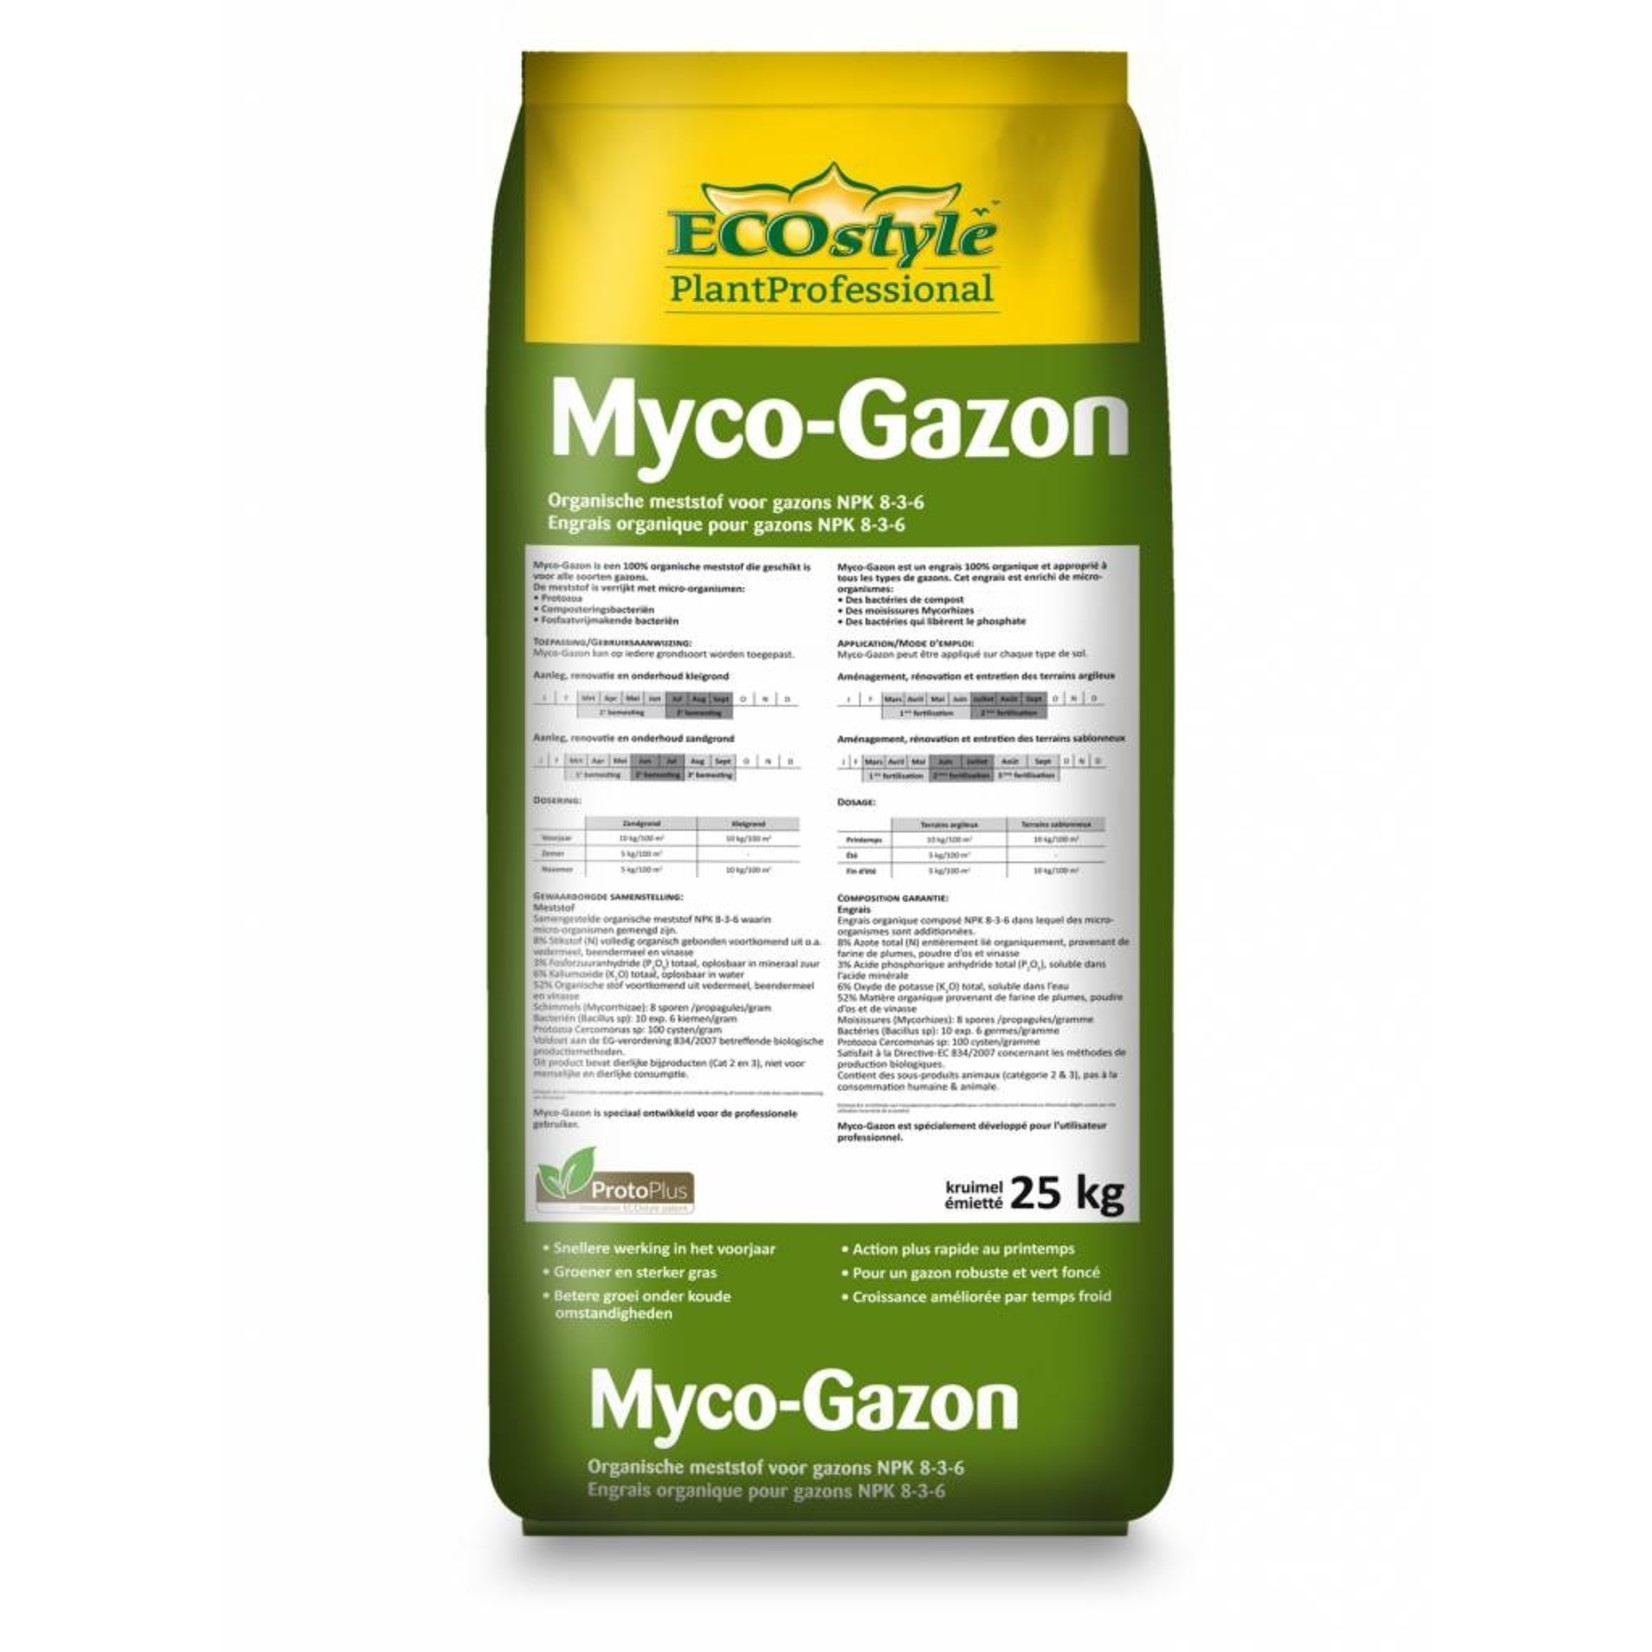 Ecostyle Professioneel Myco-Gazon Meststof 25 kg met ProtoPlus